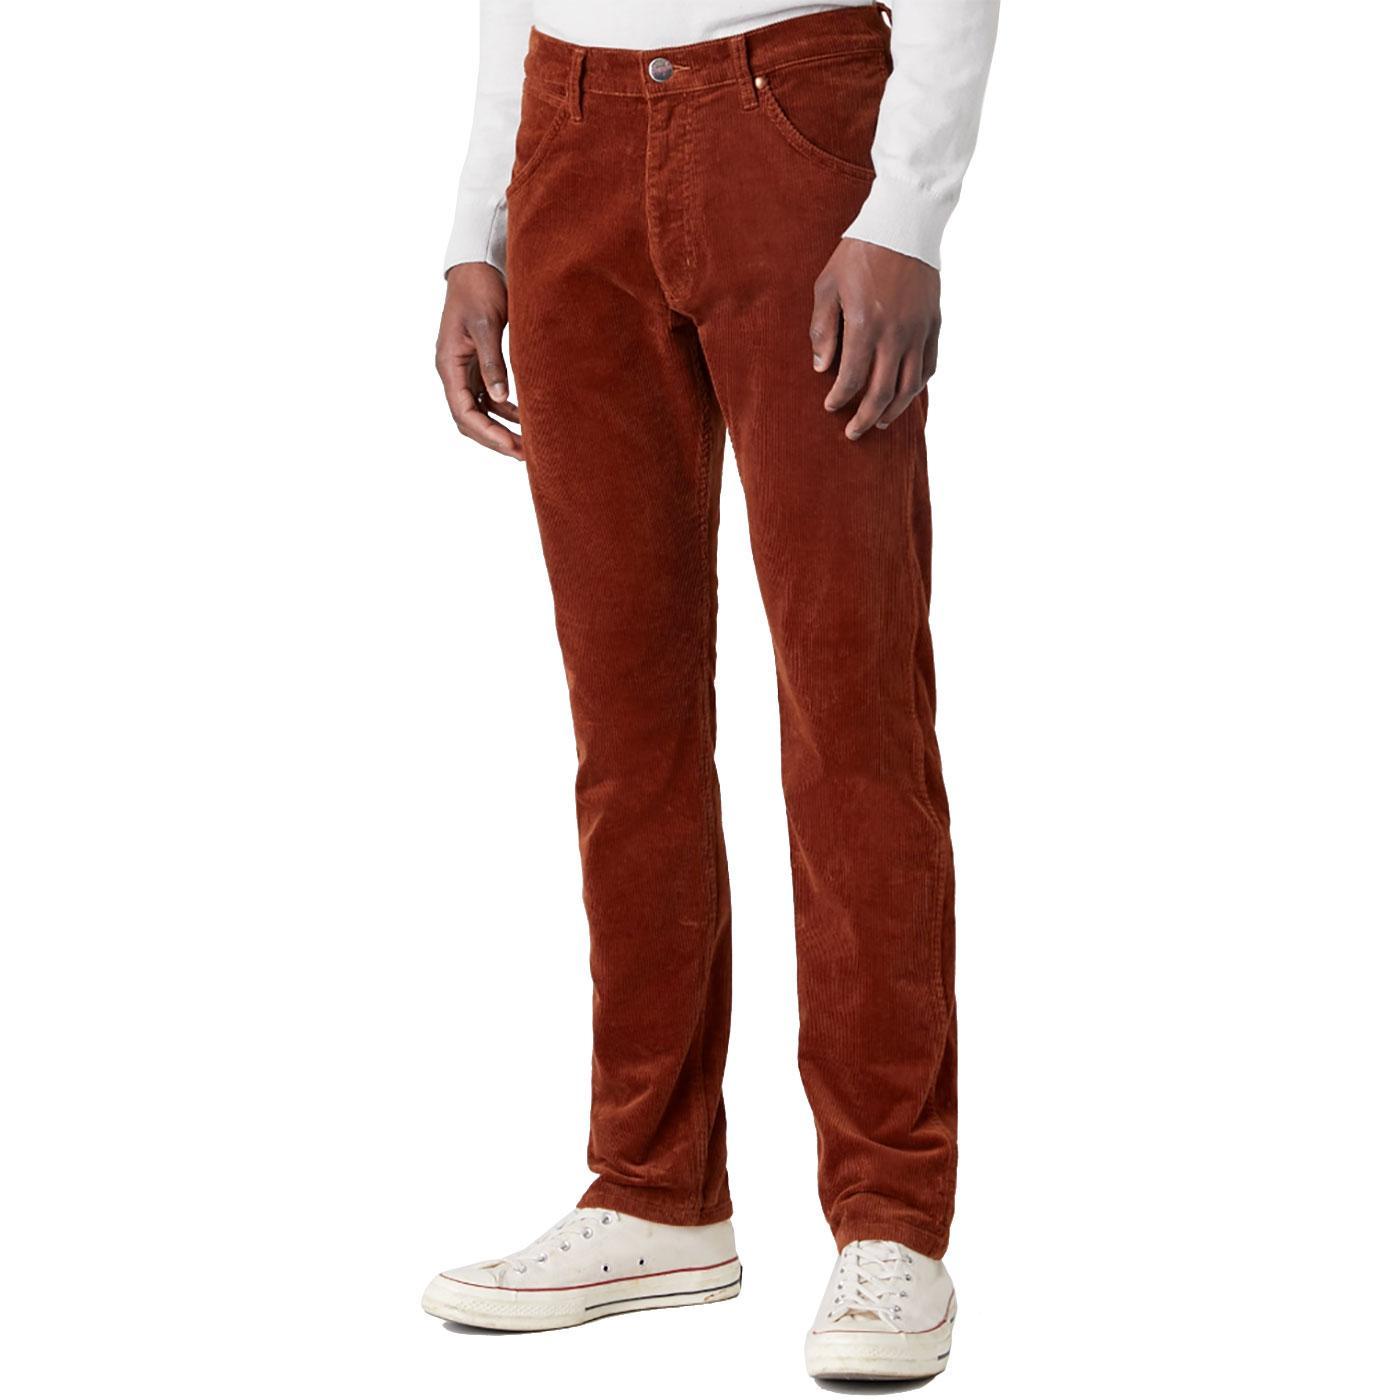 WRANGLER 11MWZ Retro 70's Slim Chunky Cord Jeans